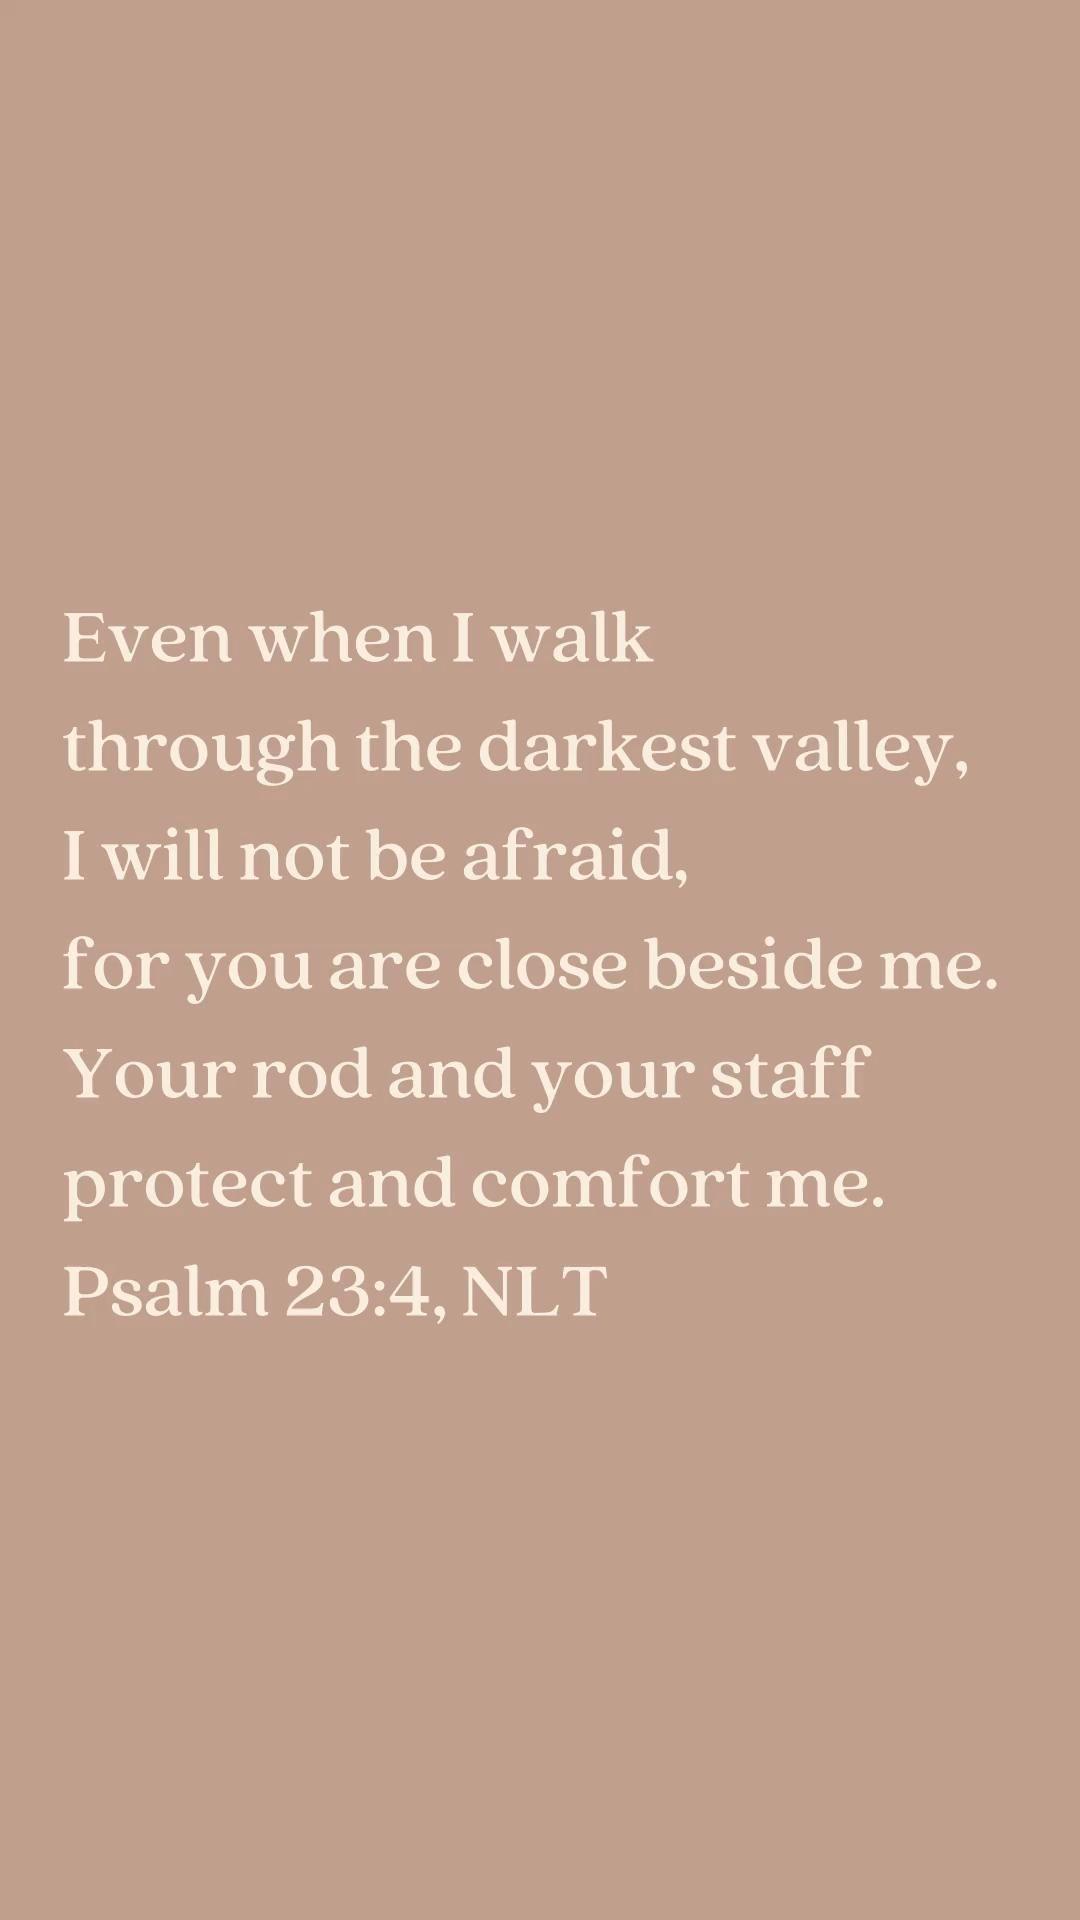 Bible quotes | Bible scripture quotes | Faith quotes | gods plan | gods timing | gods love |